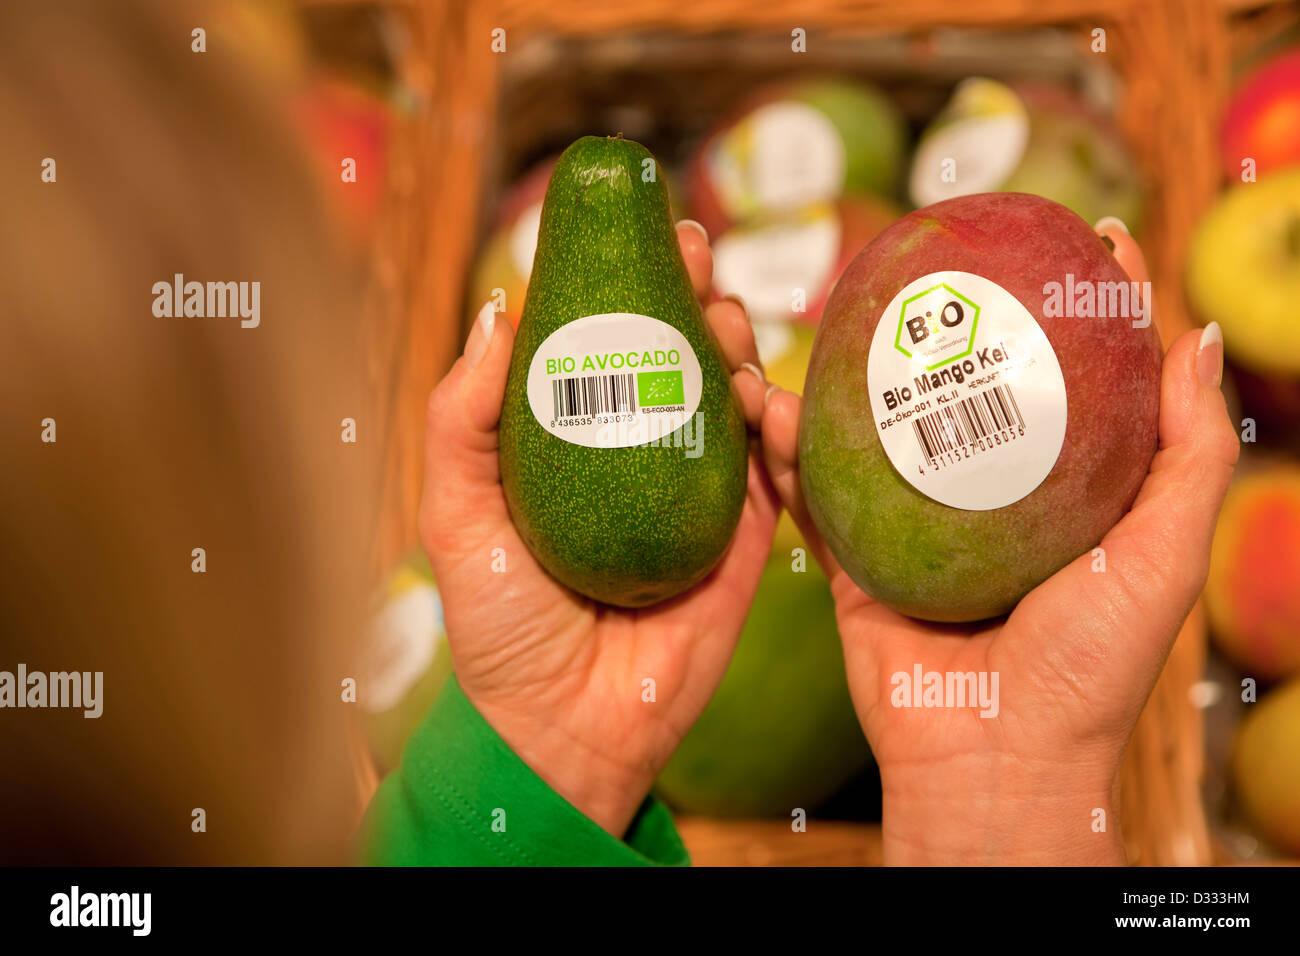 Customer buying organic products Stock Photo: 53543776 - Alamy